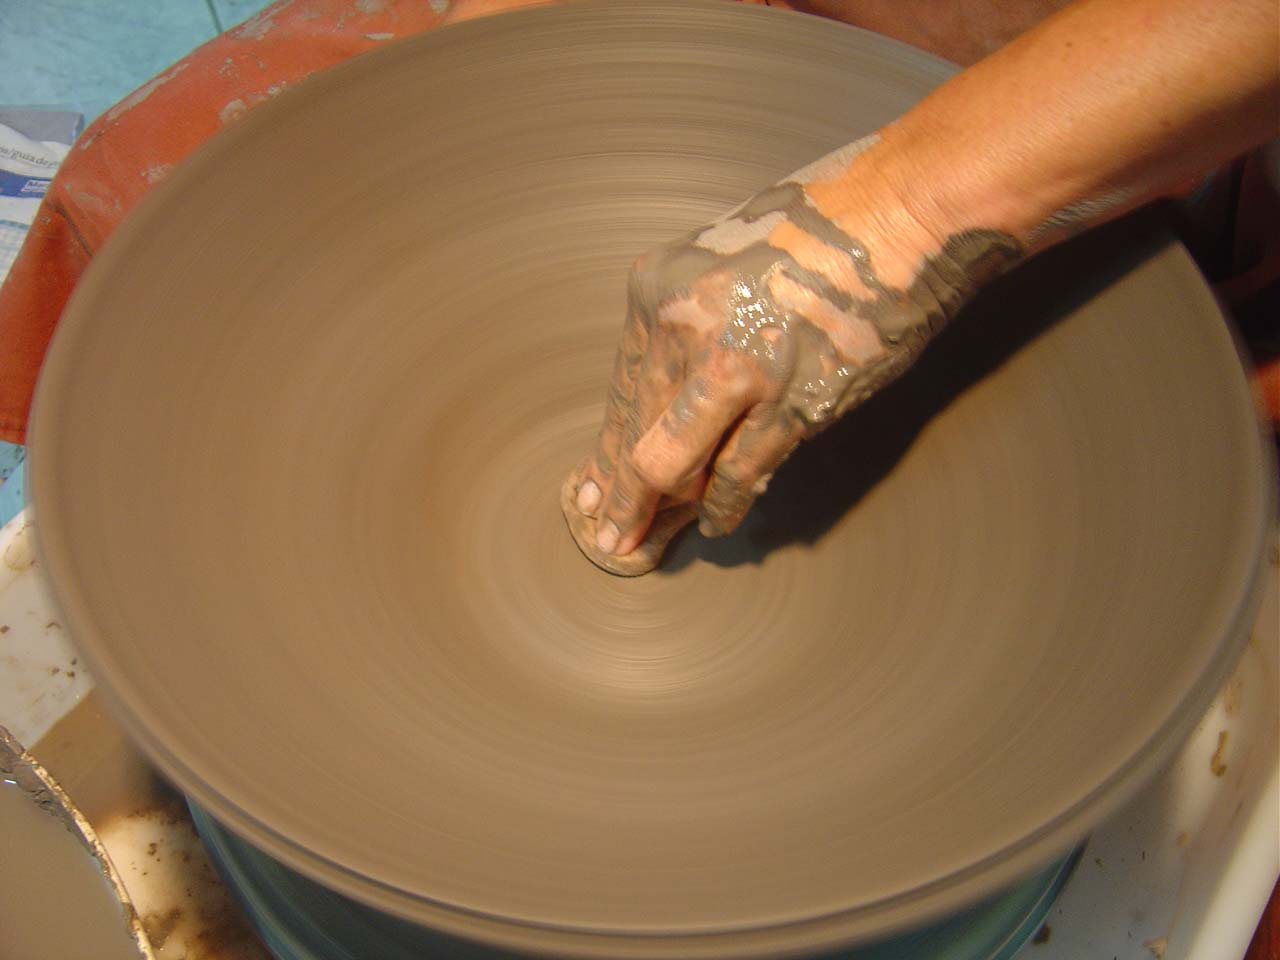 La cer mica popular espa ola artesan a con historia por for Tecnicas para esmaltar ceramica